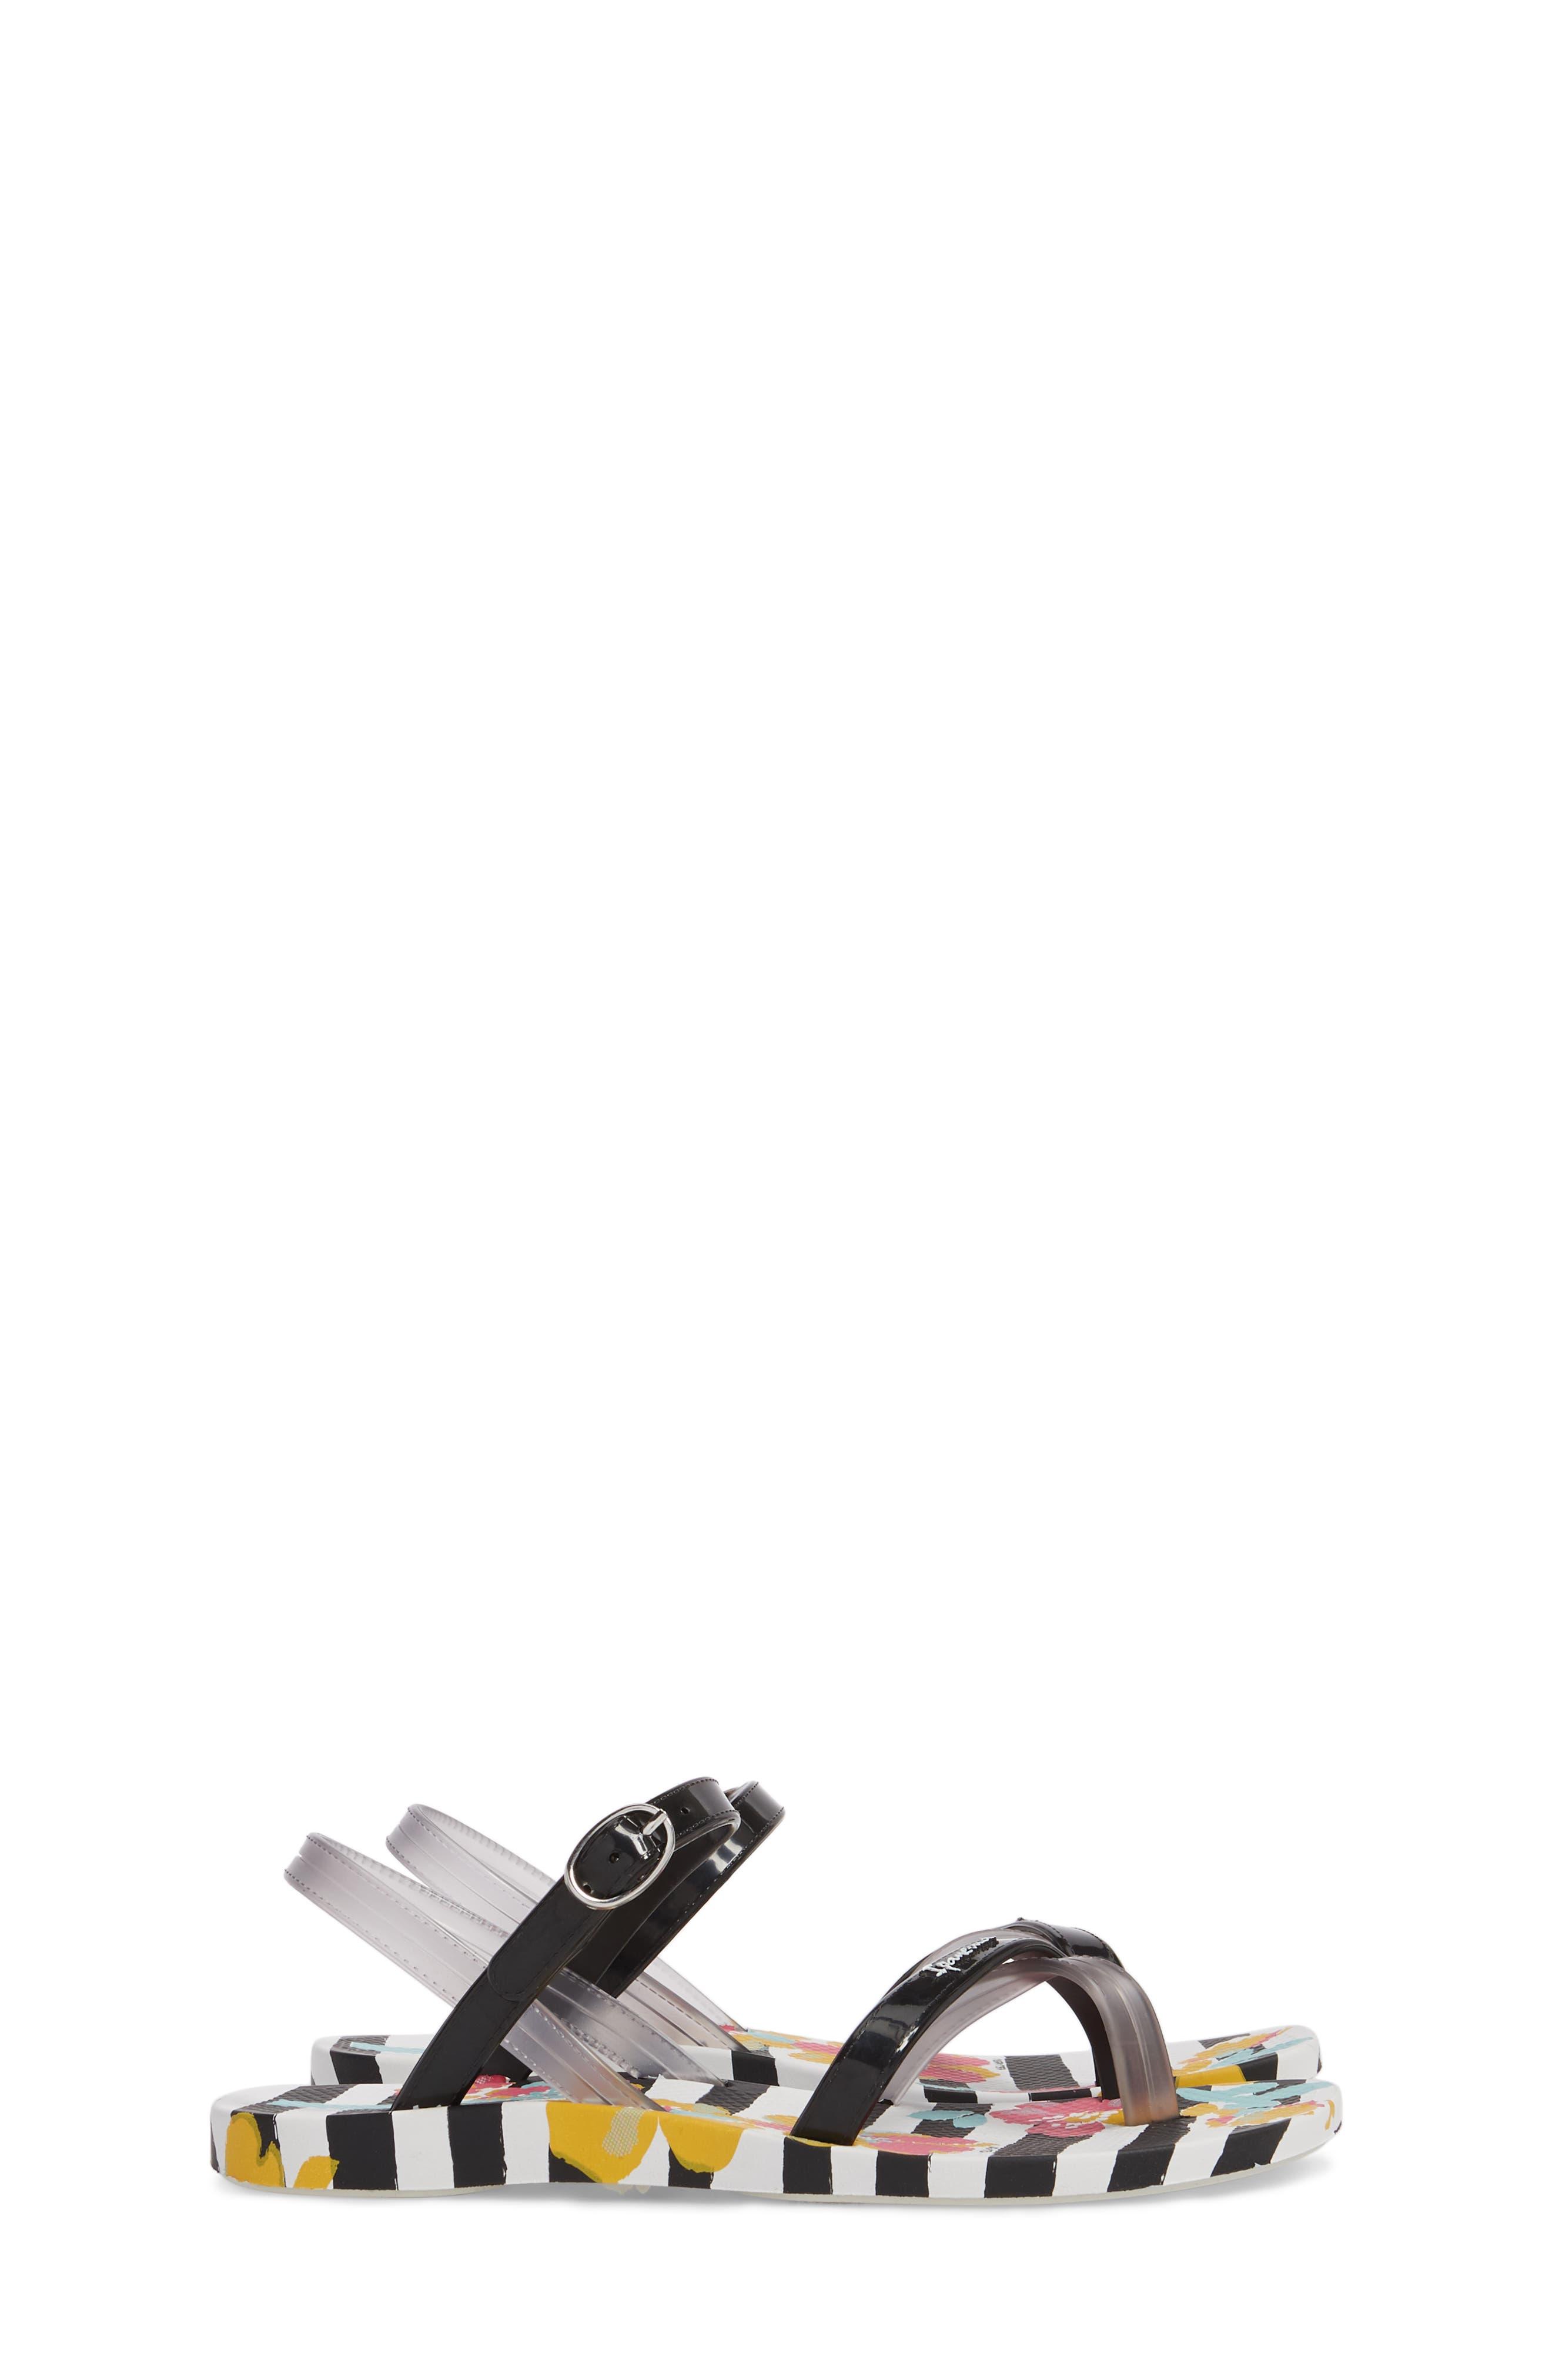 Toe Loop Sandal,                             Alternate thumbnail 4, color,                             White/ Black